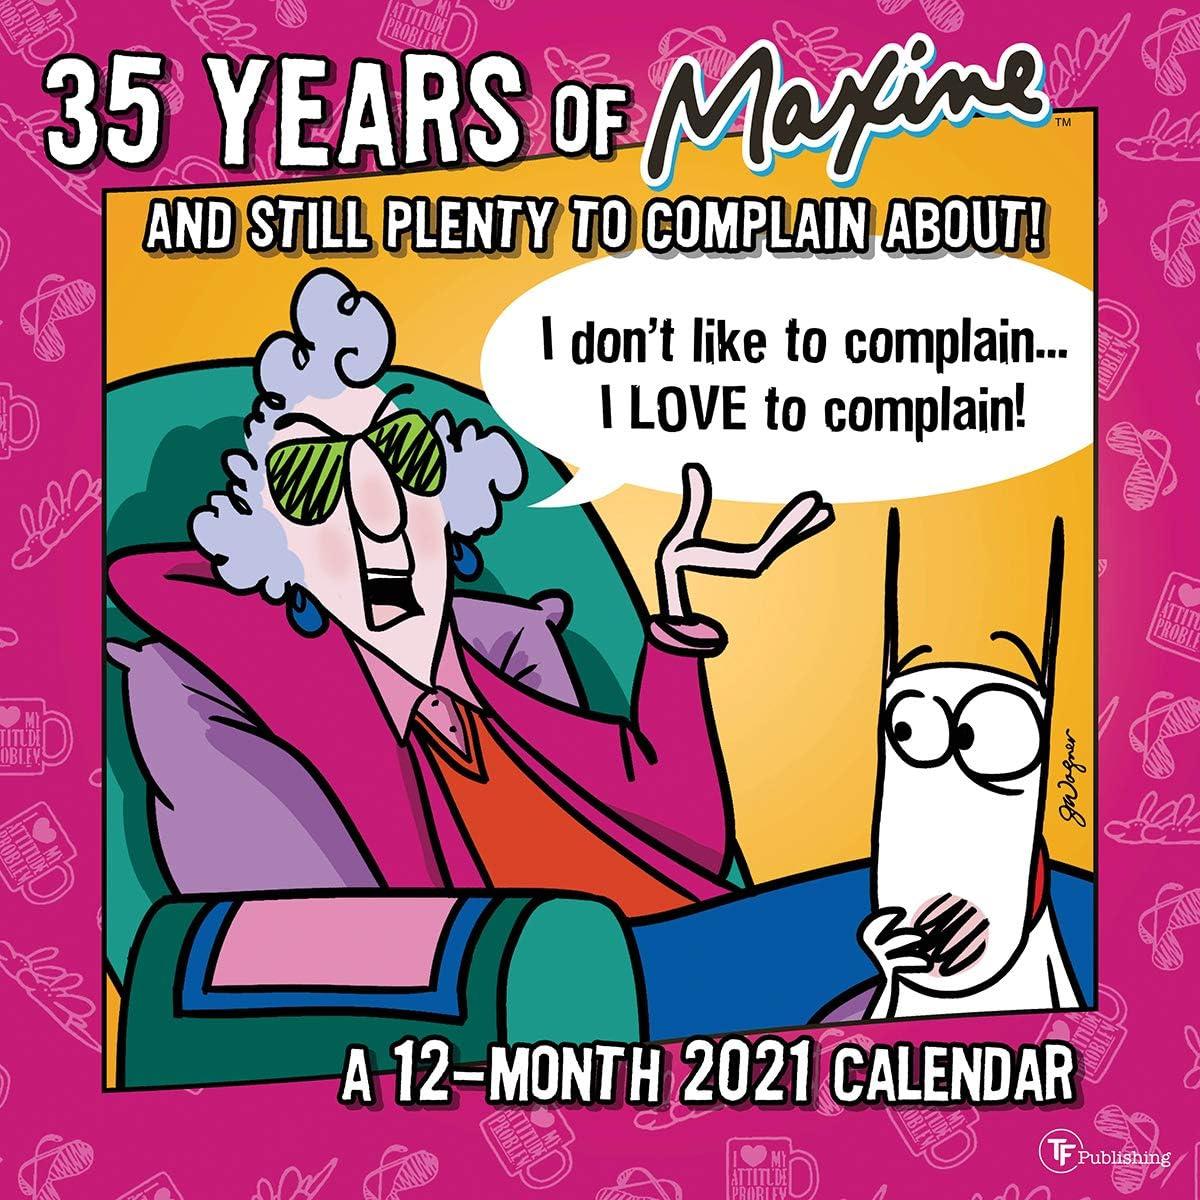 TF Publishing, 2021 Maxine Wall Calendar